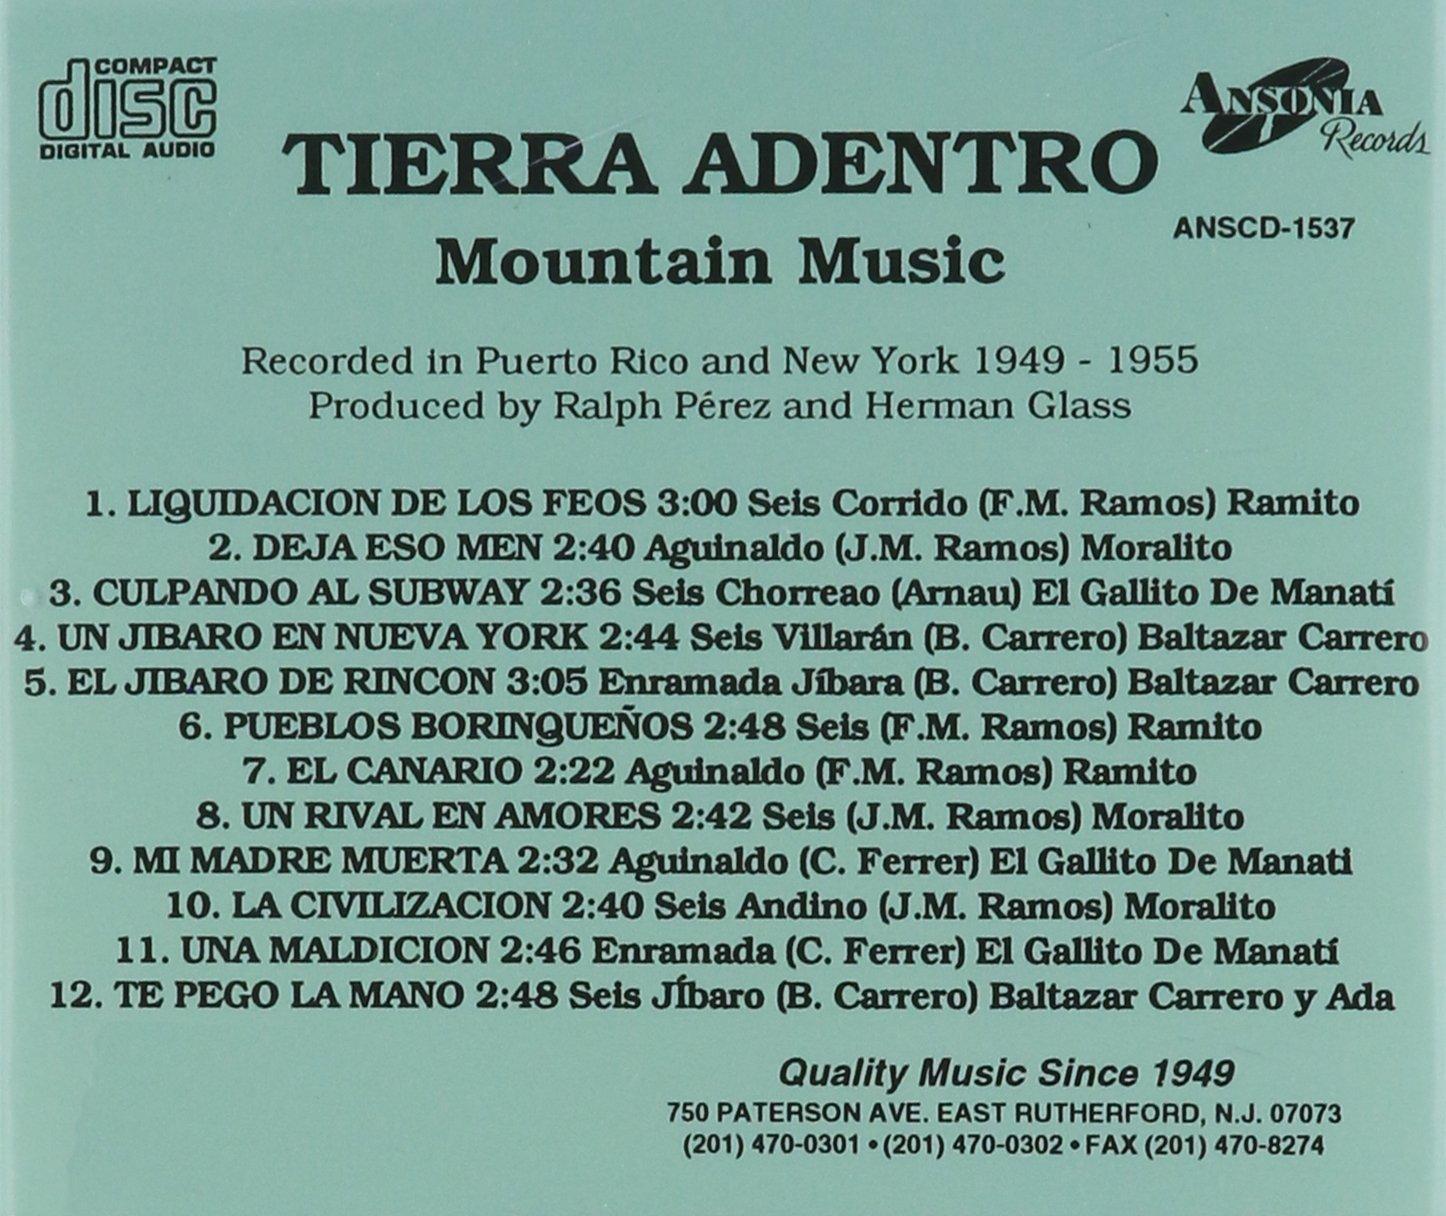 Tierra Adentro by Ansonia